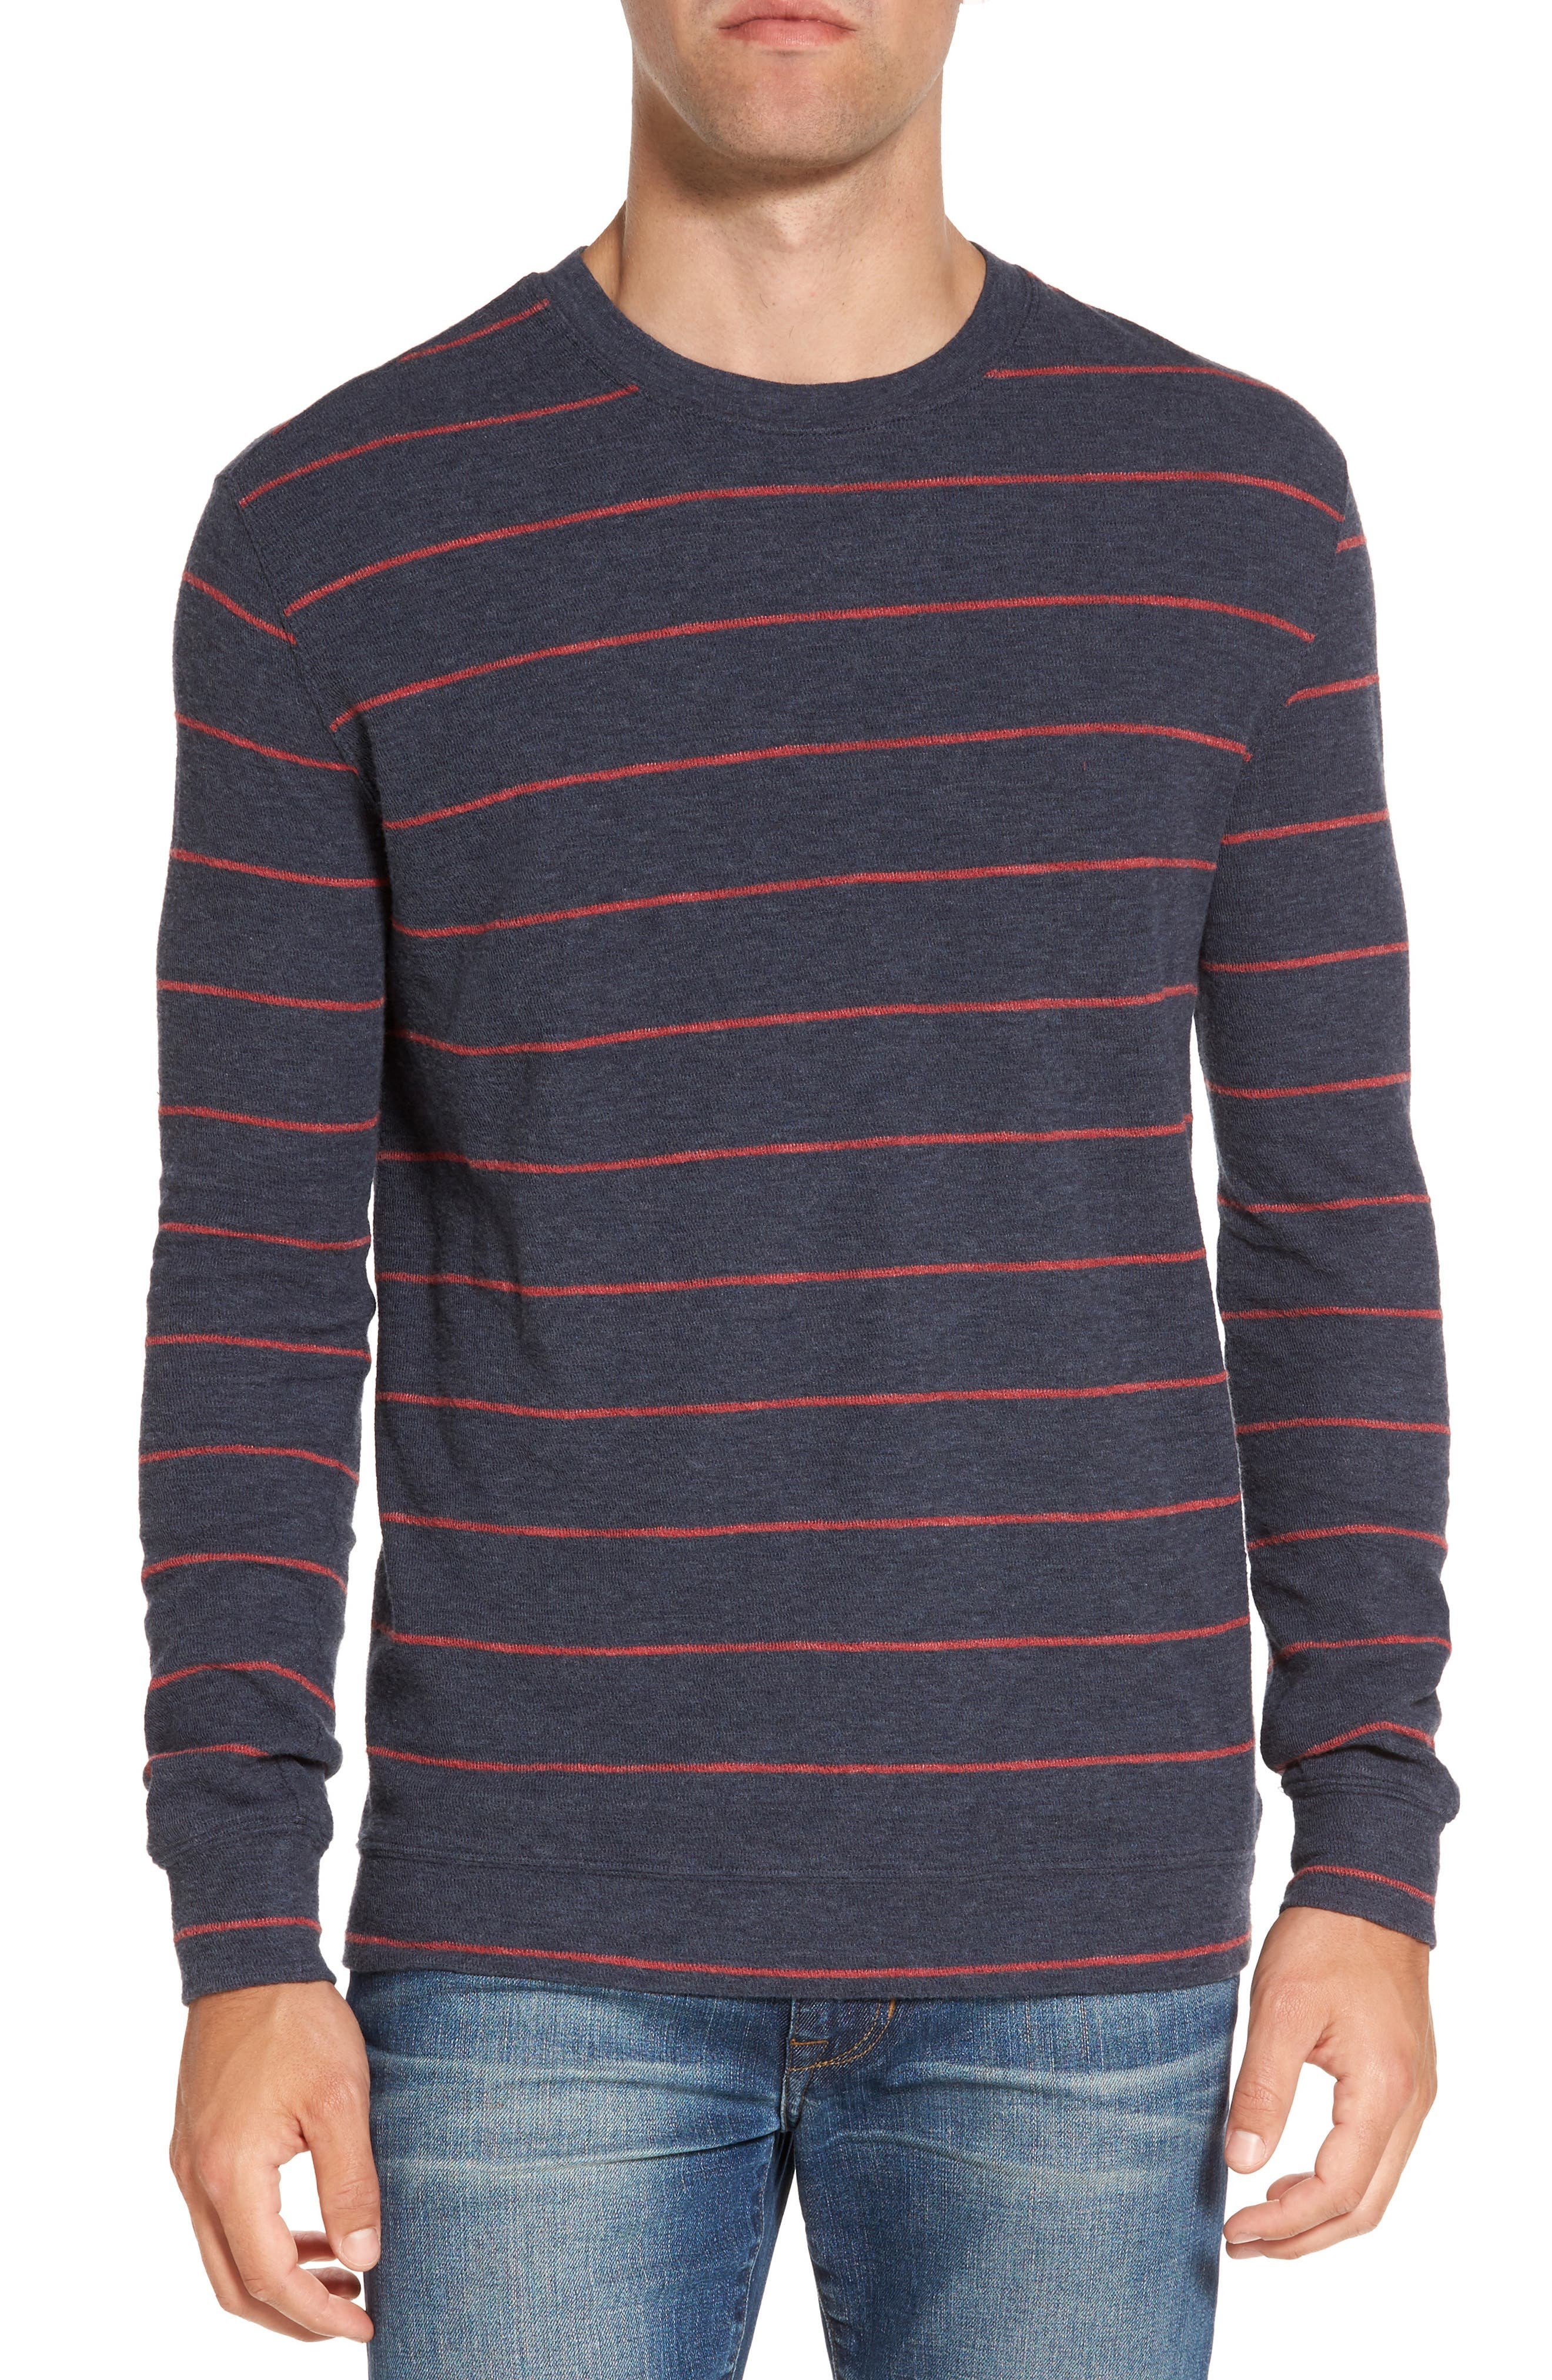 Baird Stripe Crewneck Sweatshirt,                         Main,                         color, Navy / Red